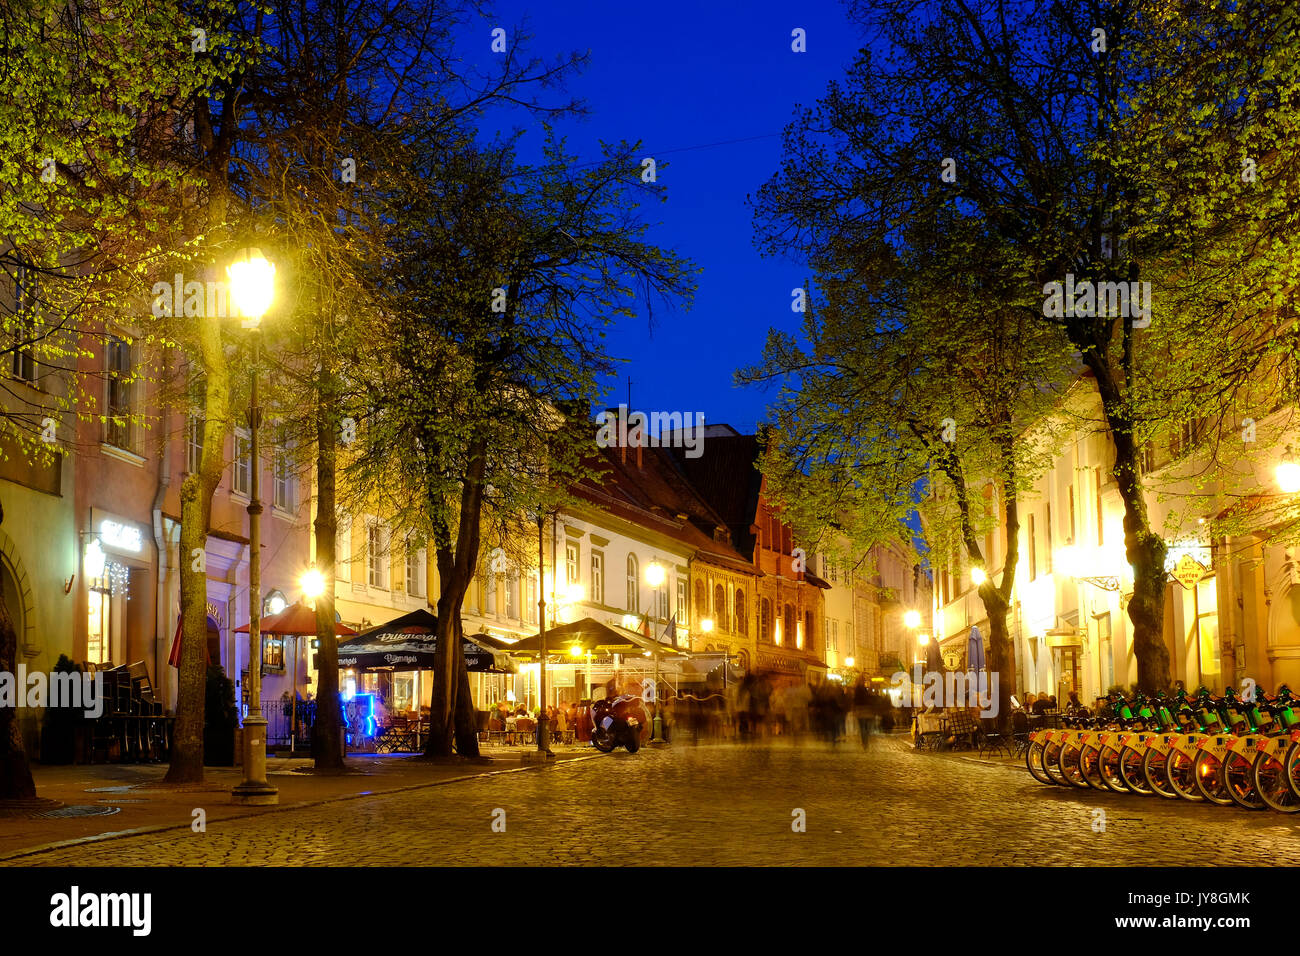 Pilies street, Vilnius, Lithuania - Stock Image